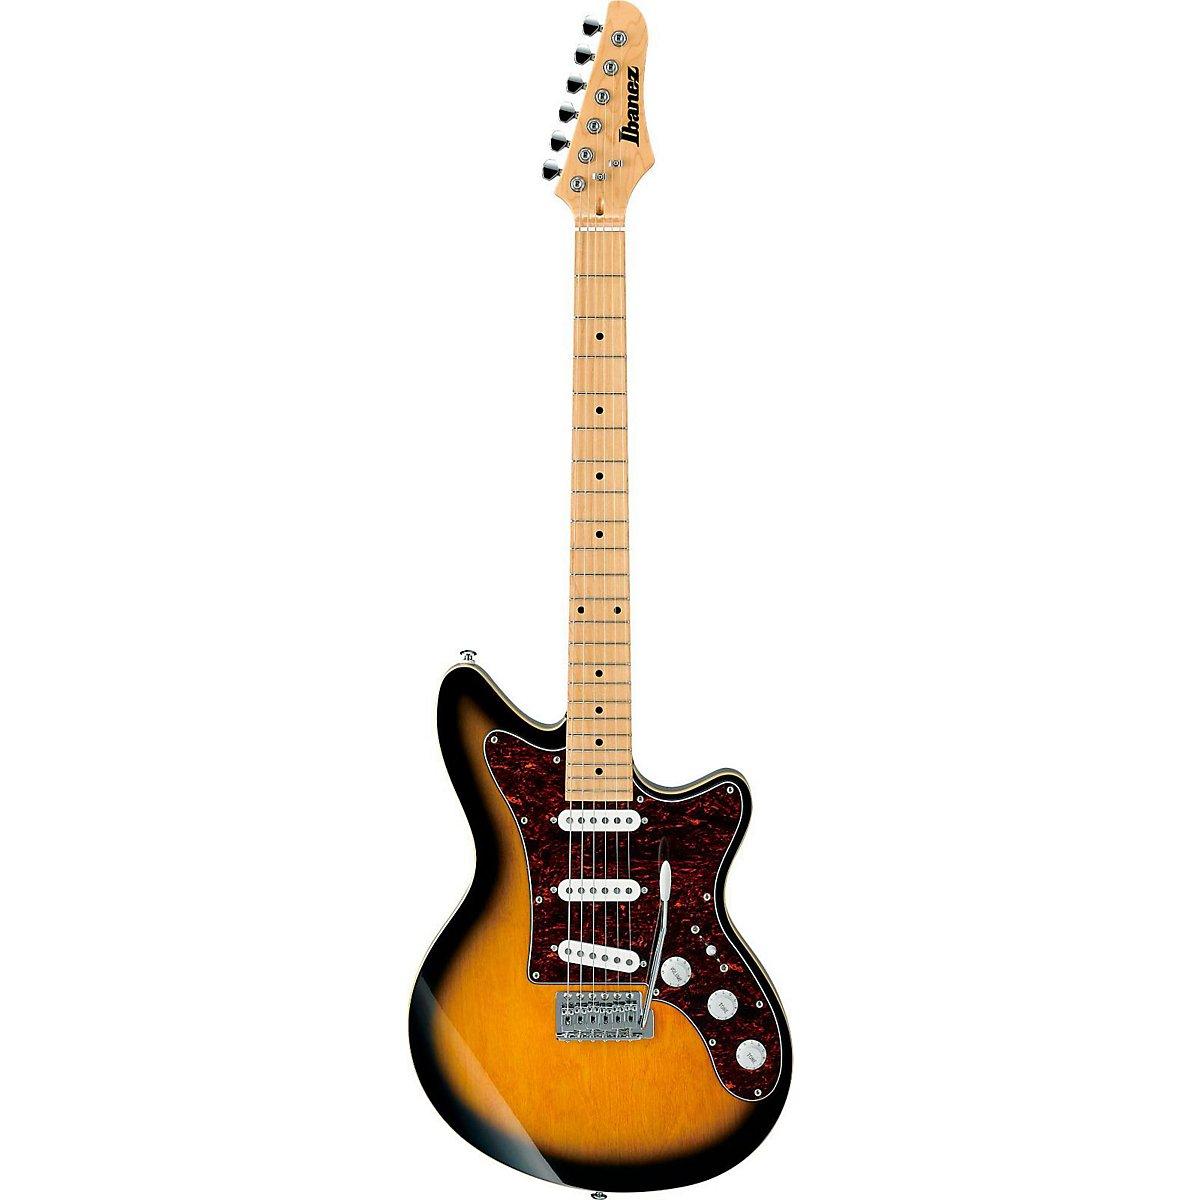 Amazon.com: Ibanez Roadcore RC430 Electric Guitar (Sunburst ...